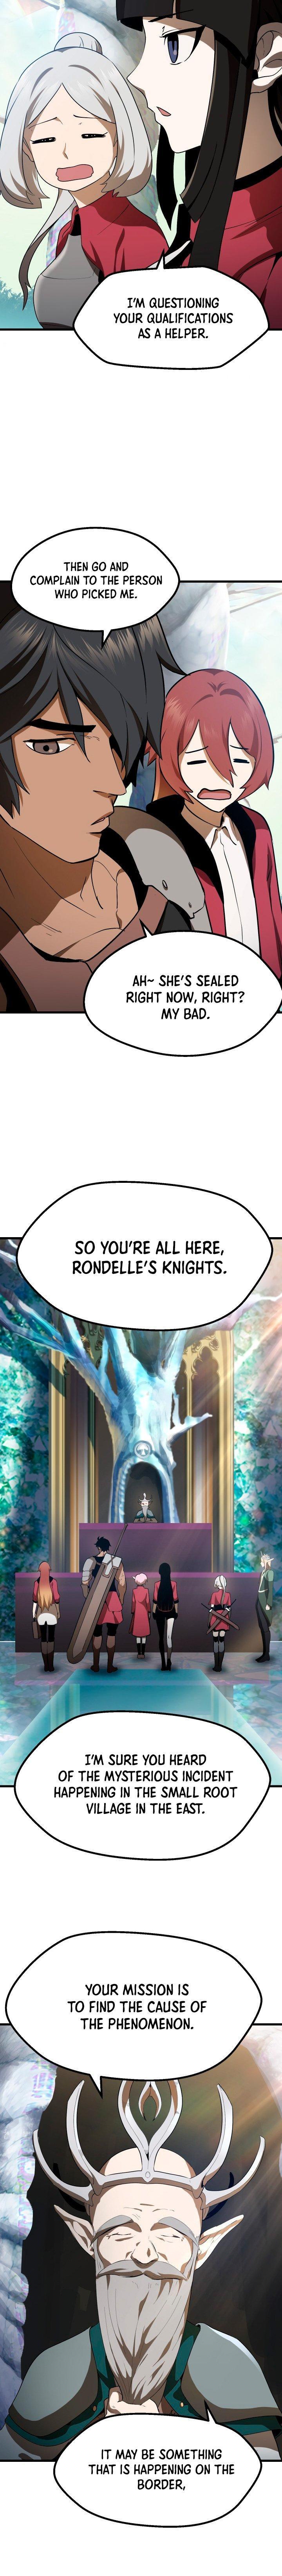 Survival Story Of A Sword King In A Fantasy World Chapter 78 page 7 - Mangakakalots.com